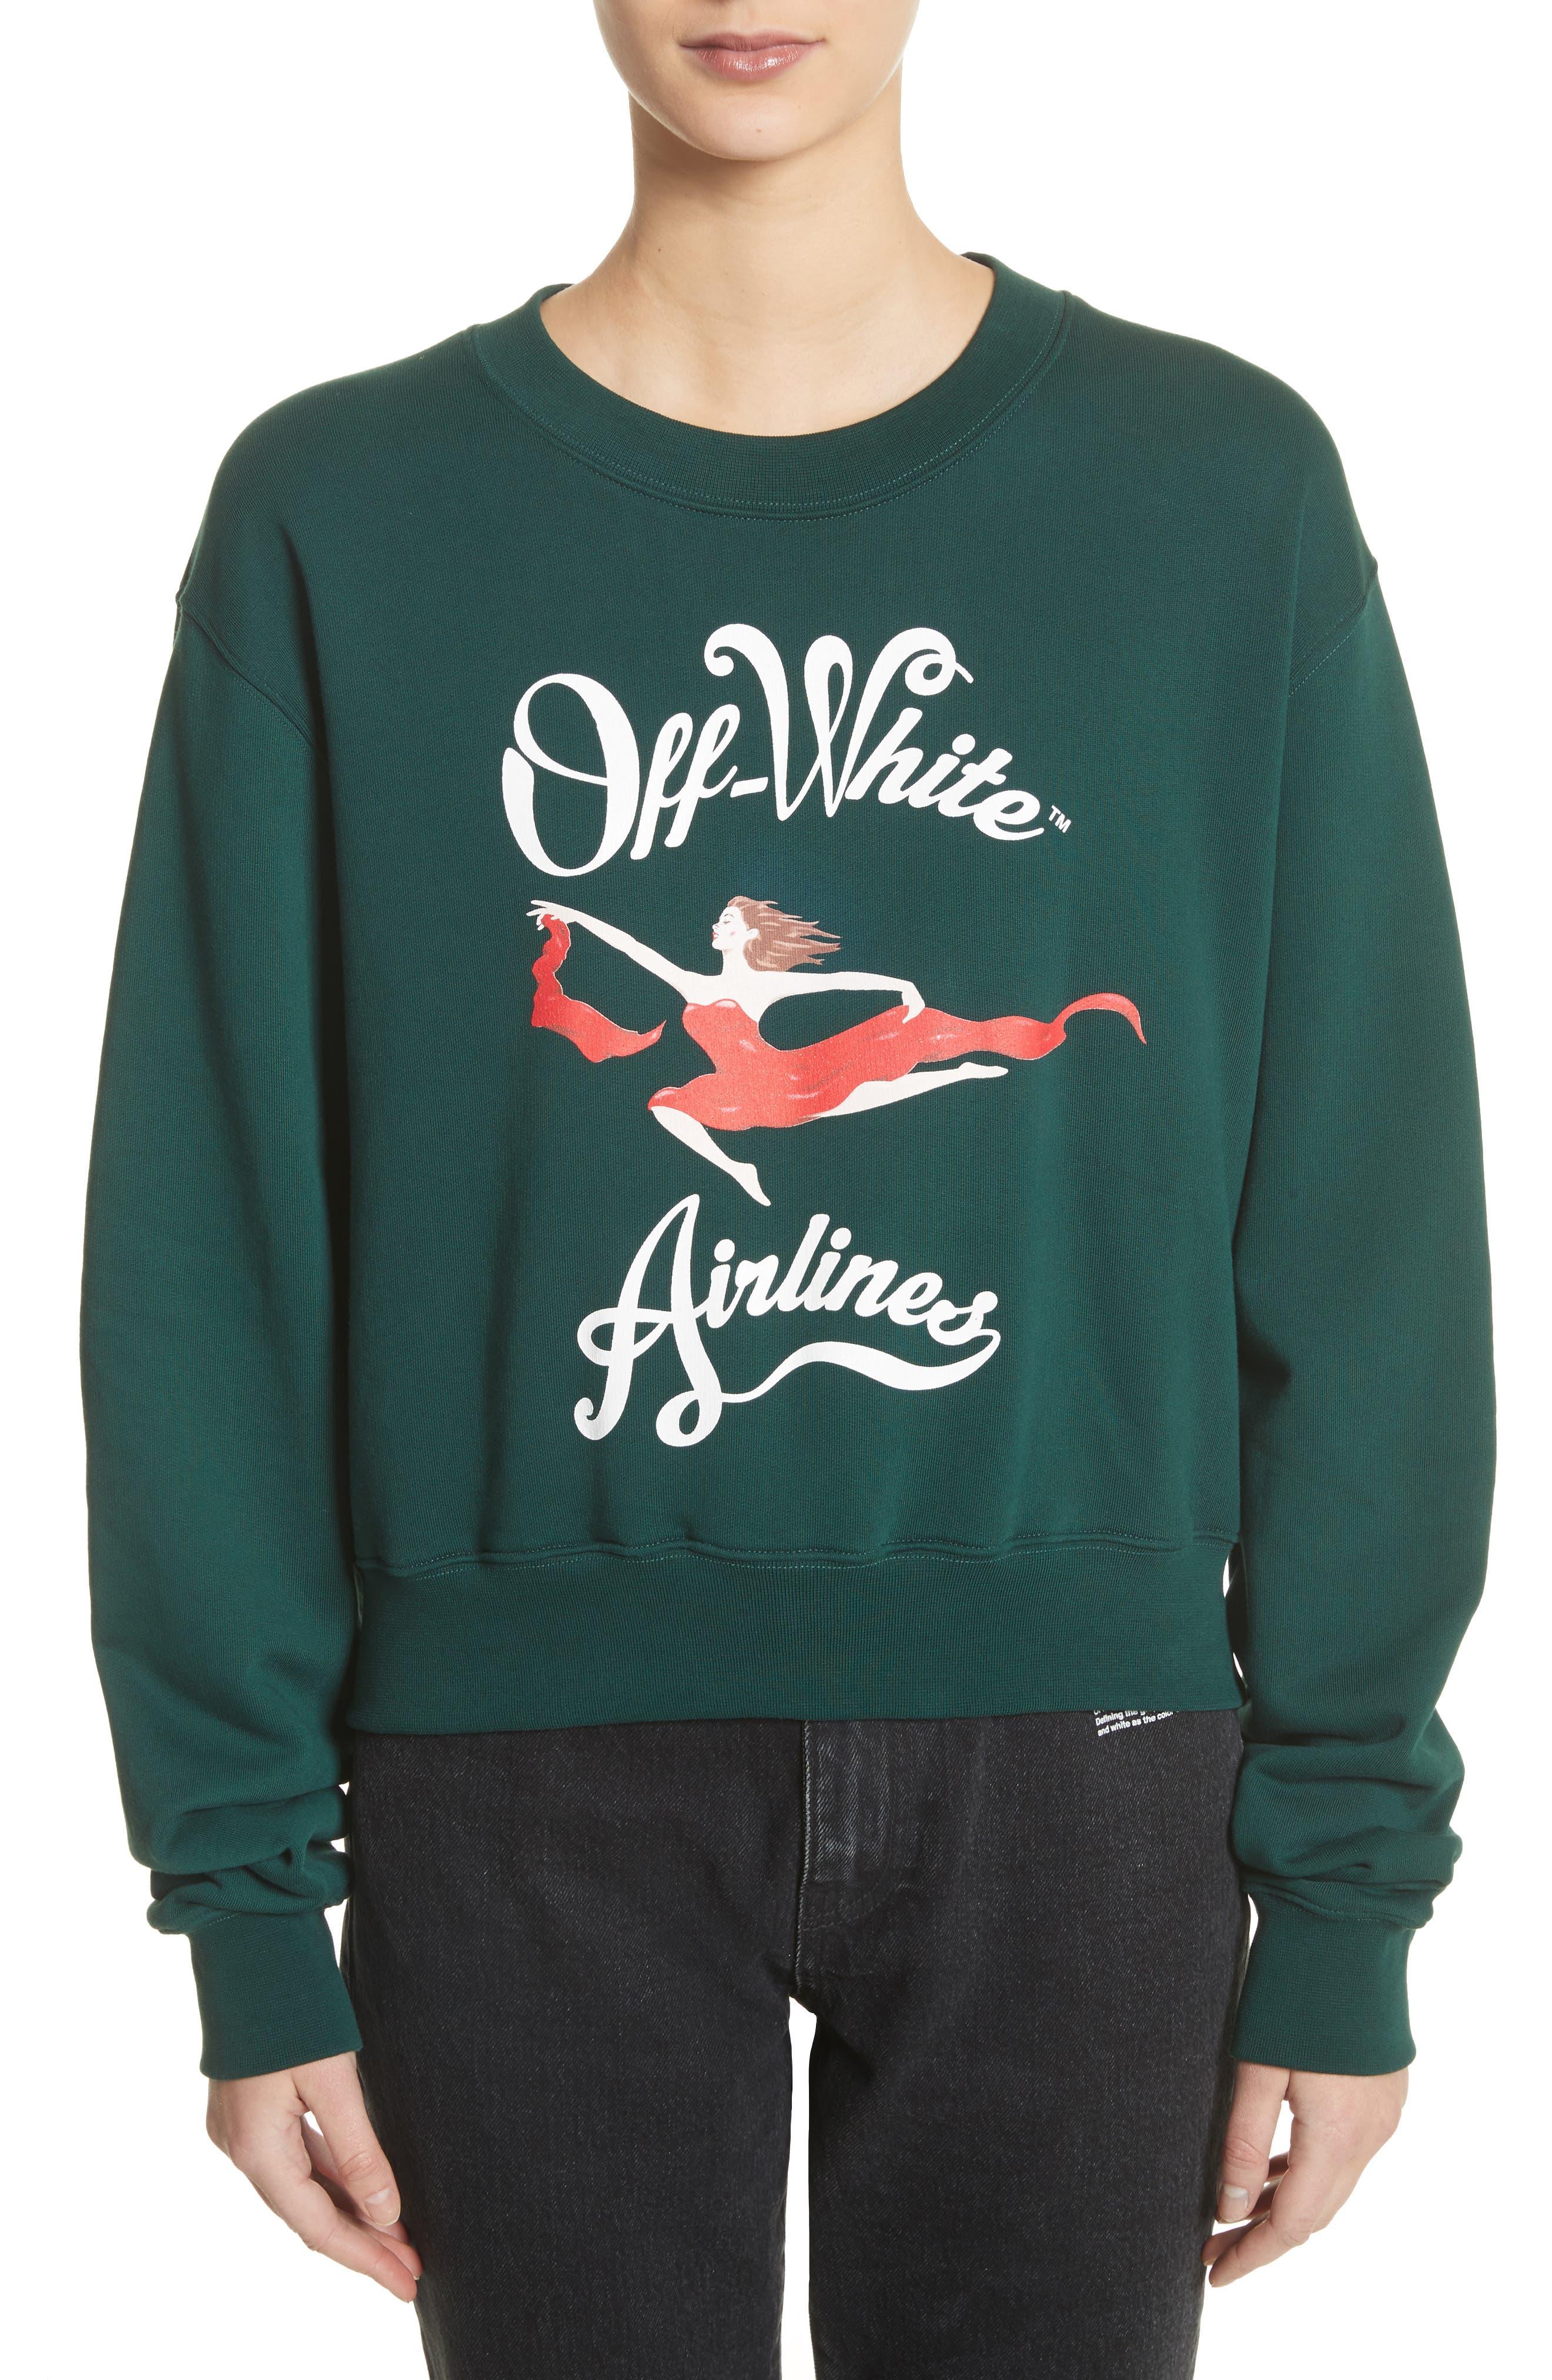 Airlines Crop Crewneck Sweatshirt,                             Main thumbnail 1, color,                             Dark Green